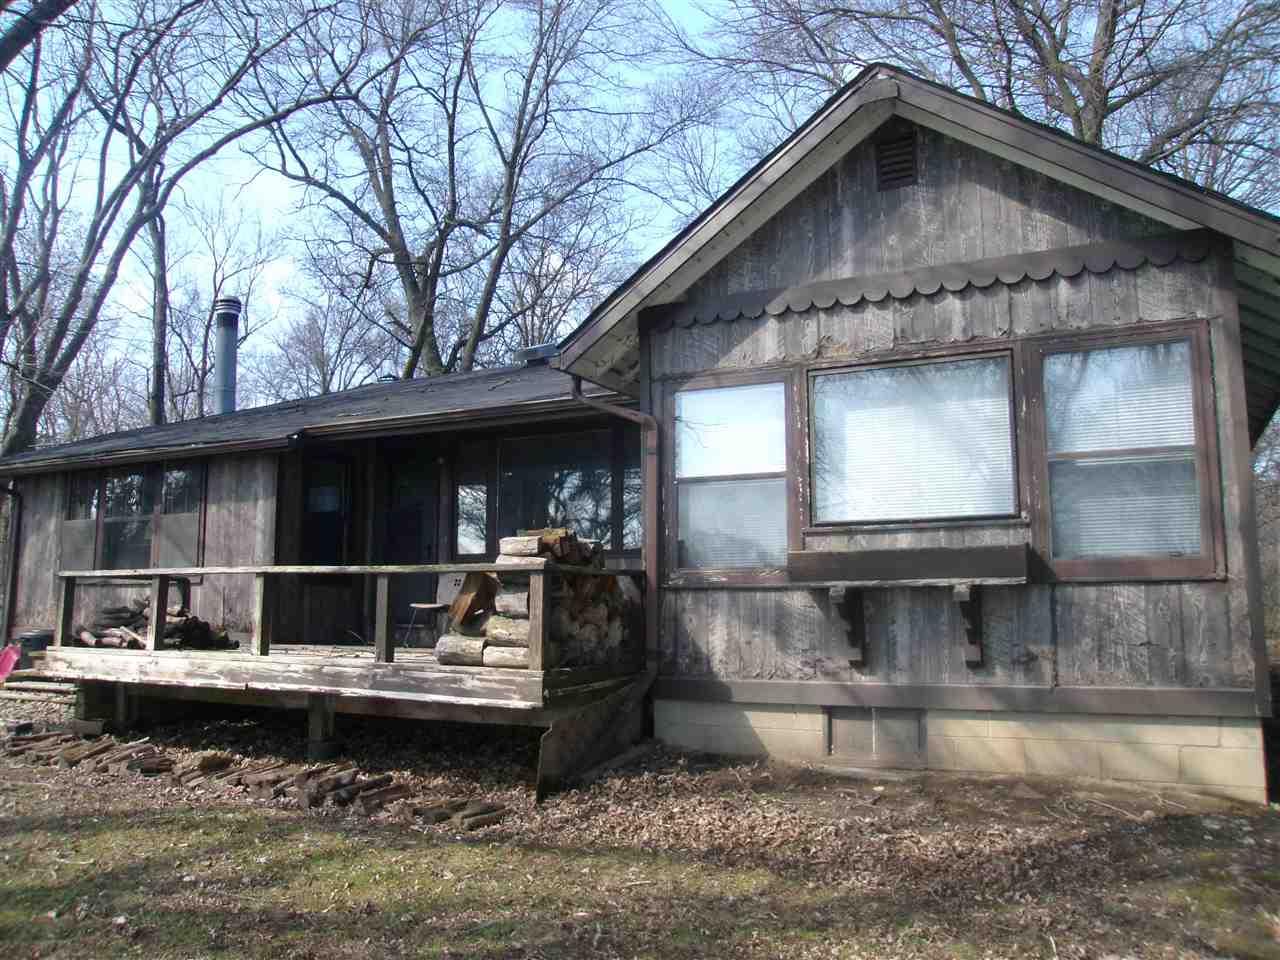 W10989 BLACKHAWK TR, Fox Lake, WI 53933